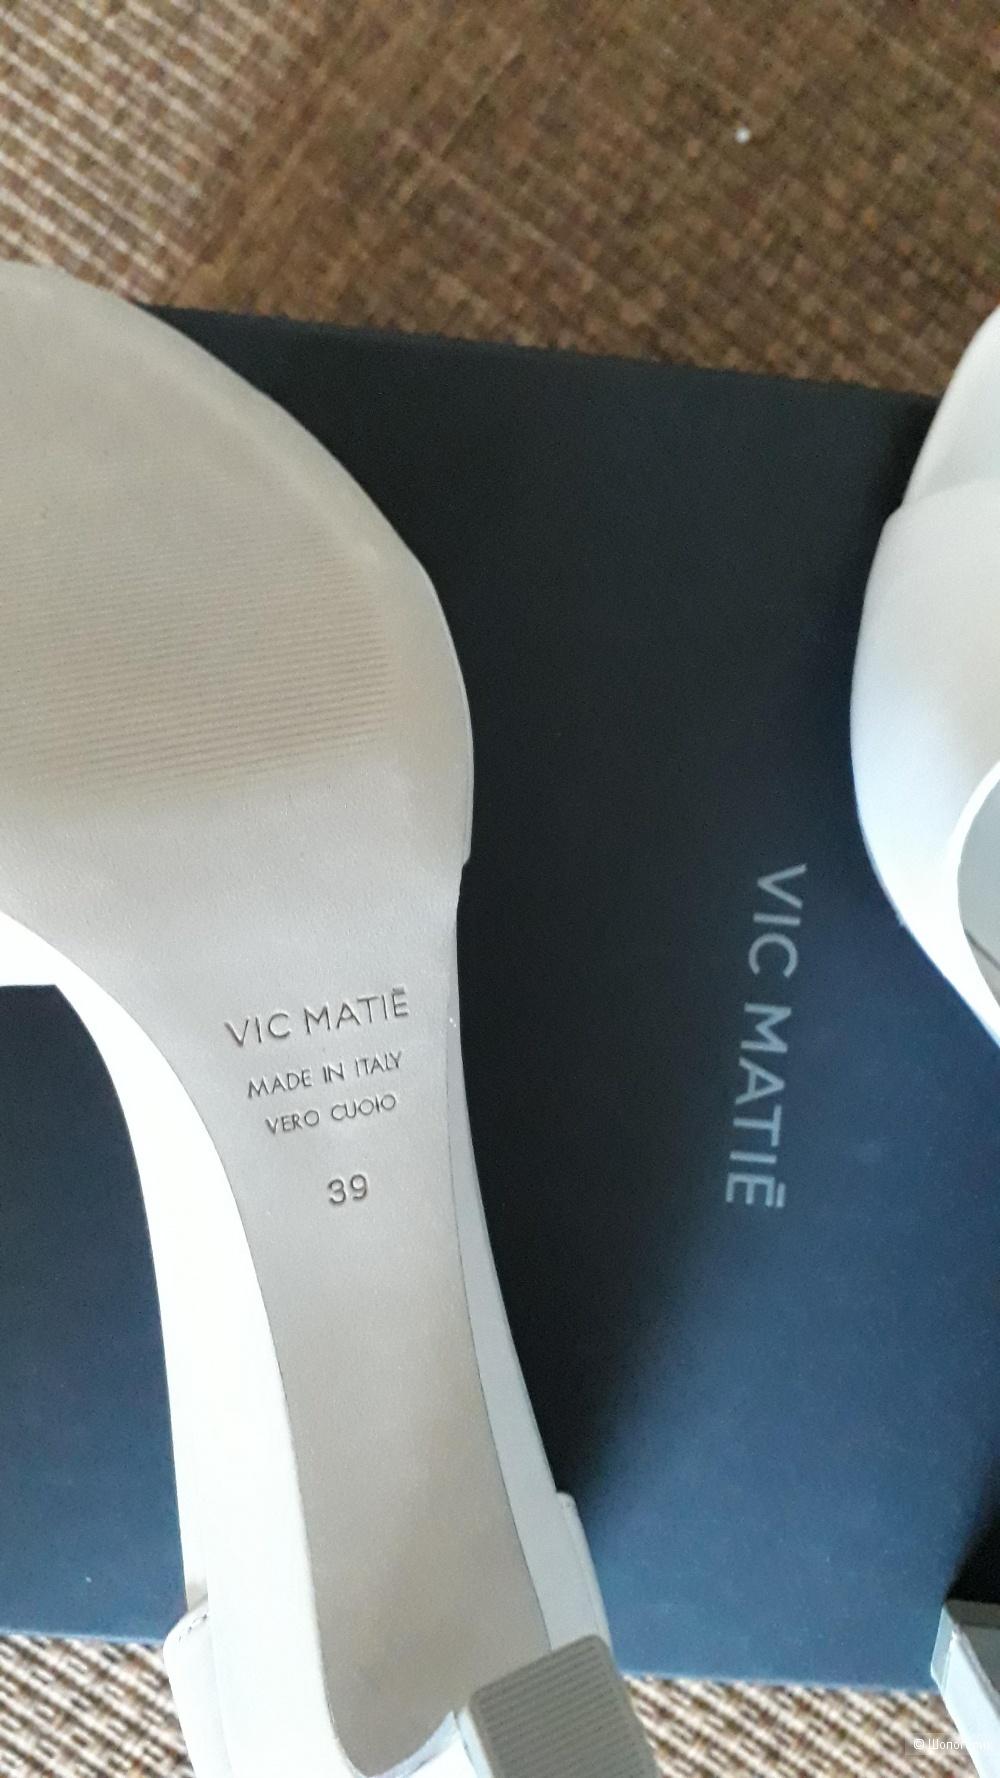 Сандалии (босоножки) VIC MATIE 39